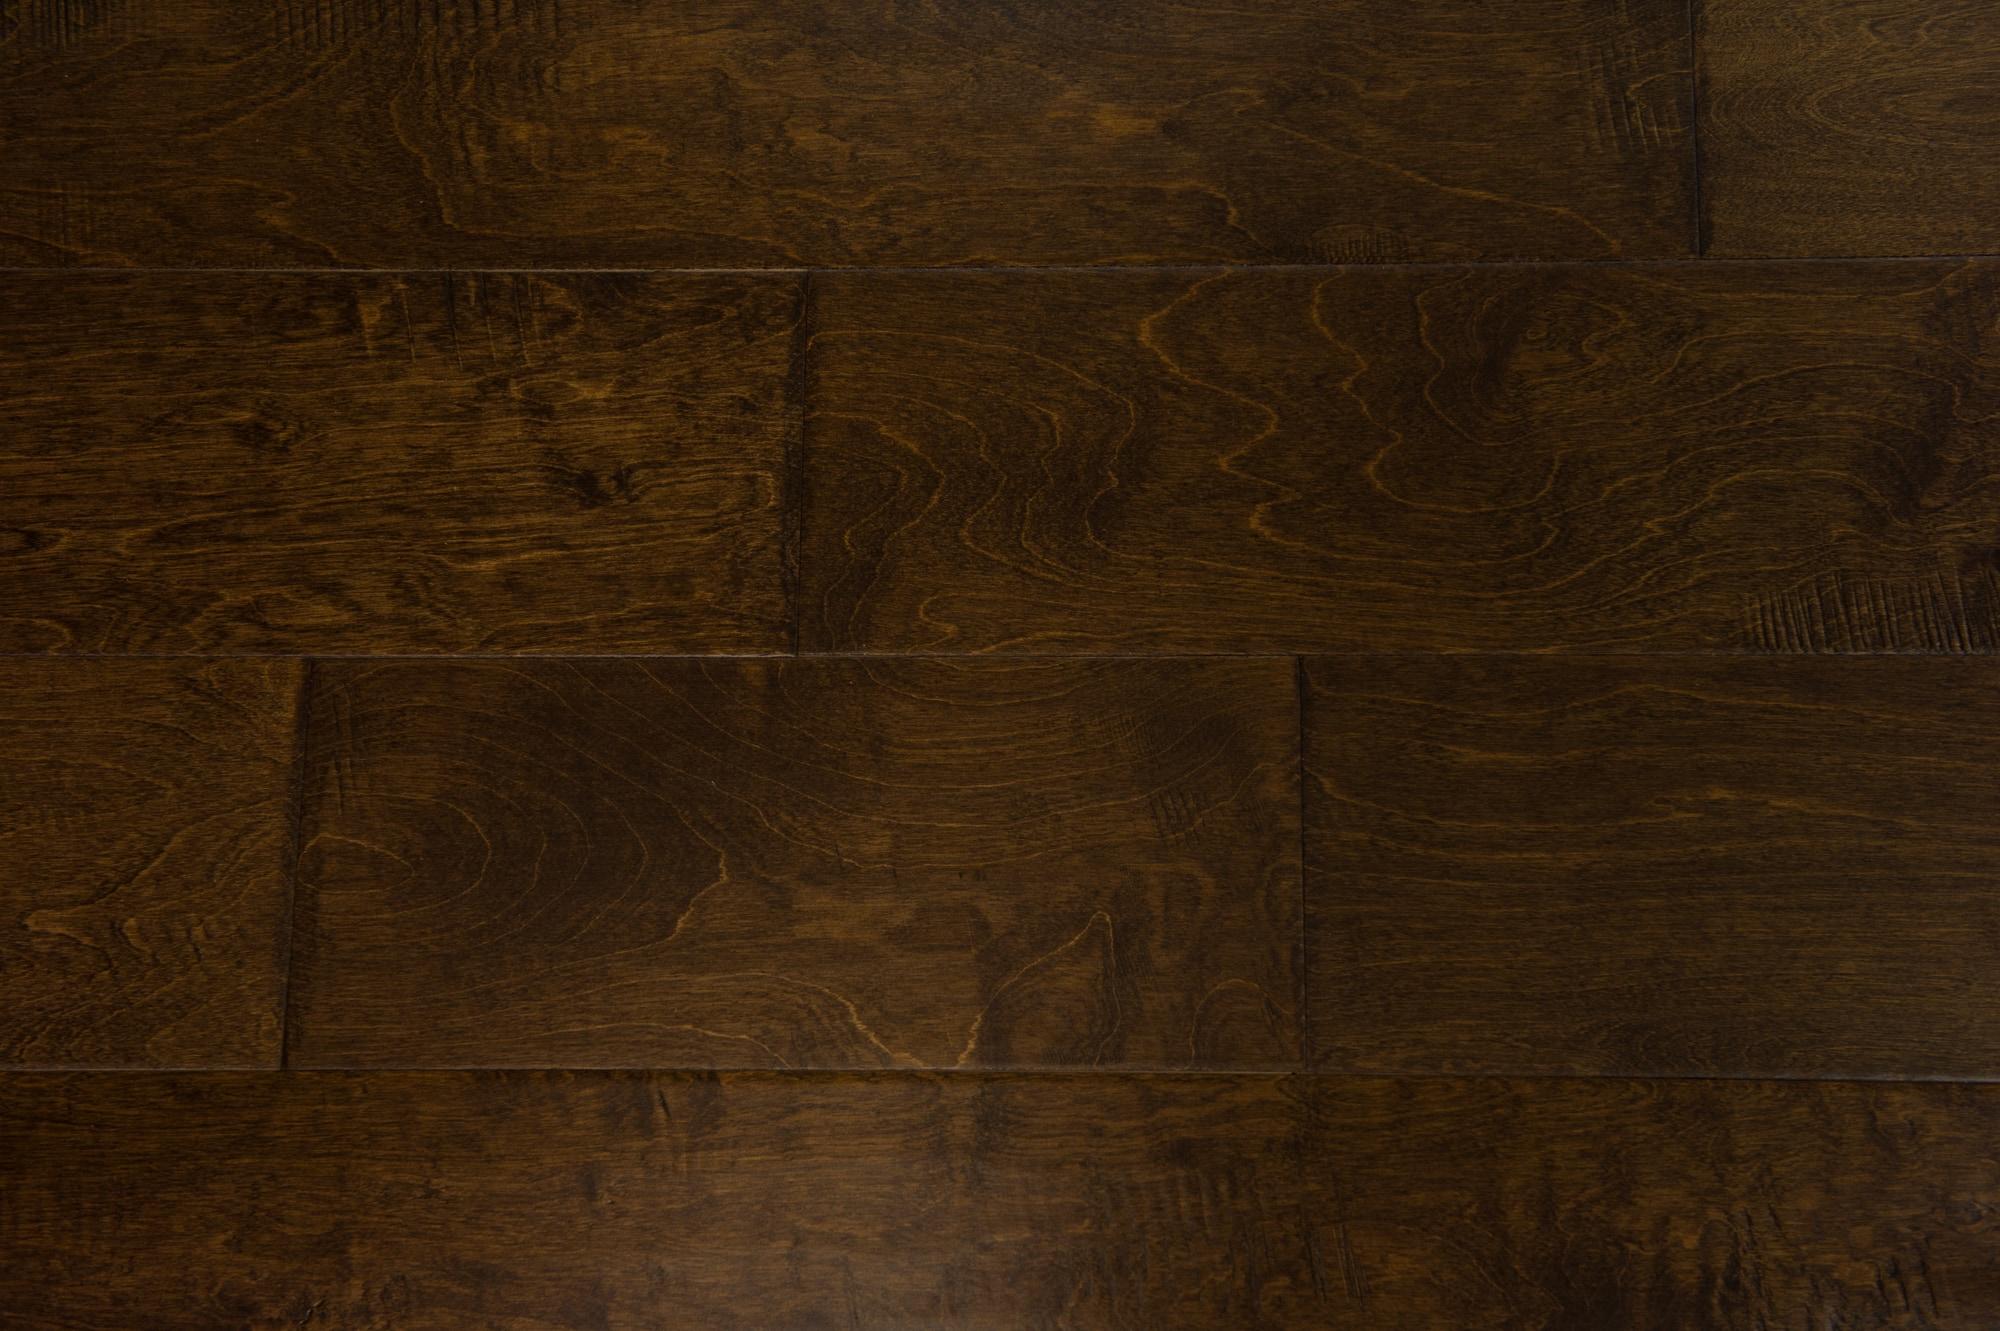 Dark Chocolate / Baltic Birch / Urethane / ABC / Sample Engineered Hardwood - Baltic Birch - Belmont Collection 0